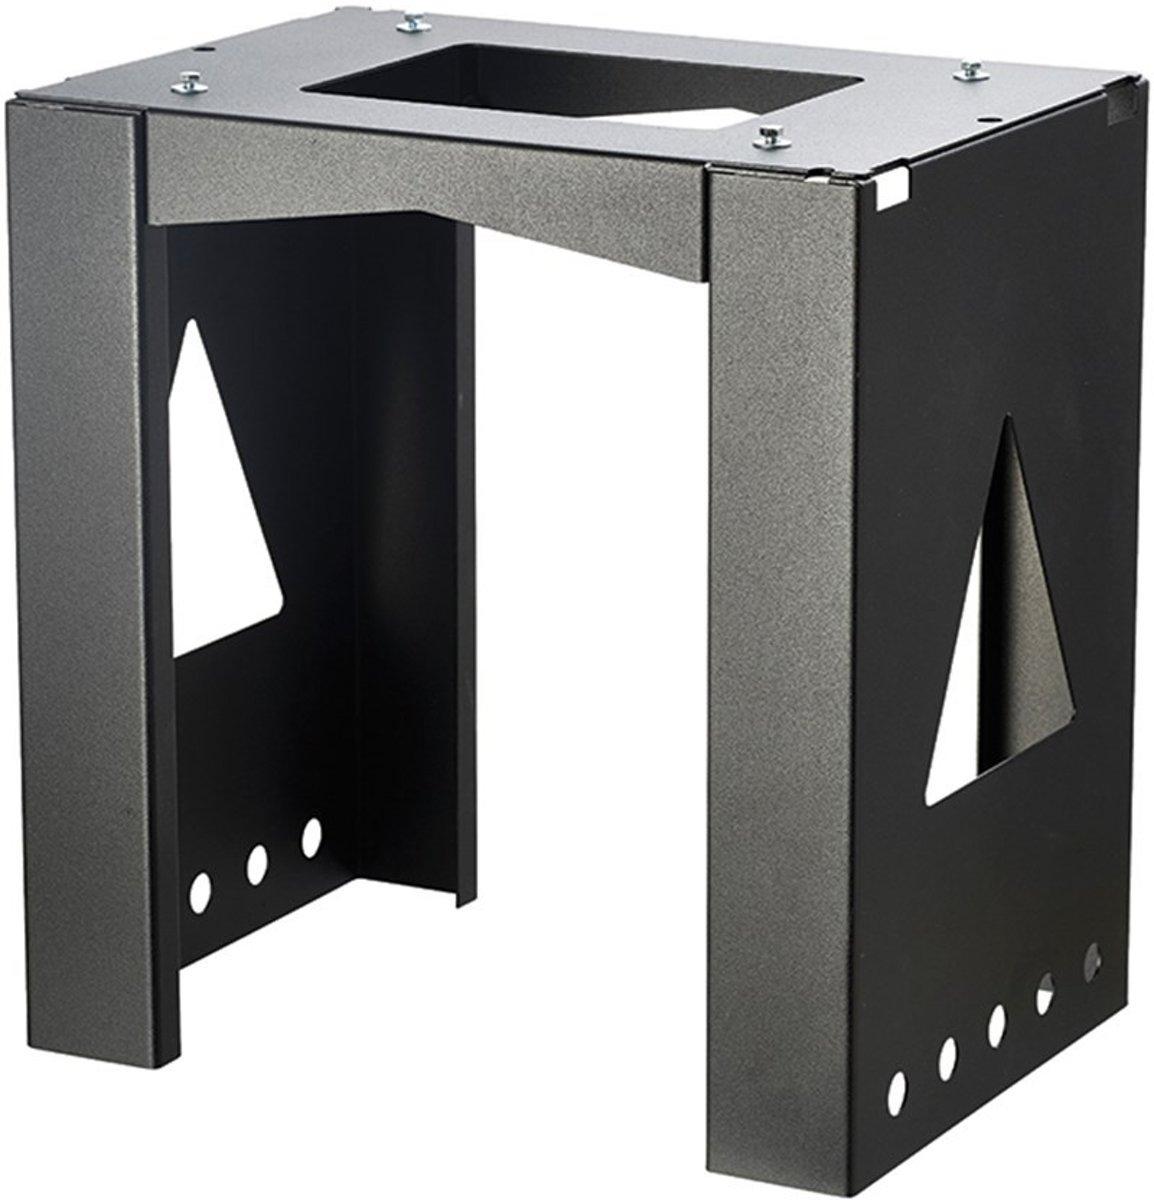 Allux Pakketkast Verankering Allux 8002 - Zwart